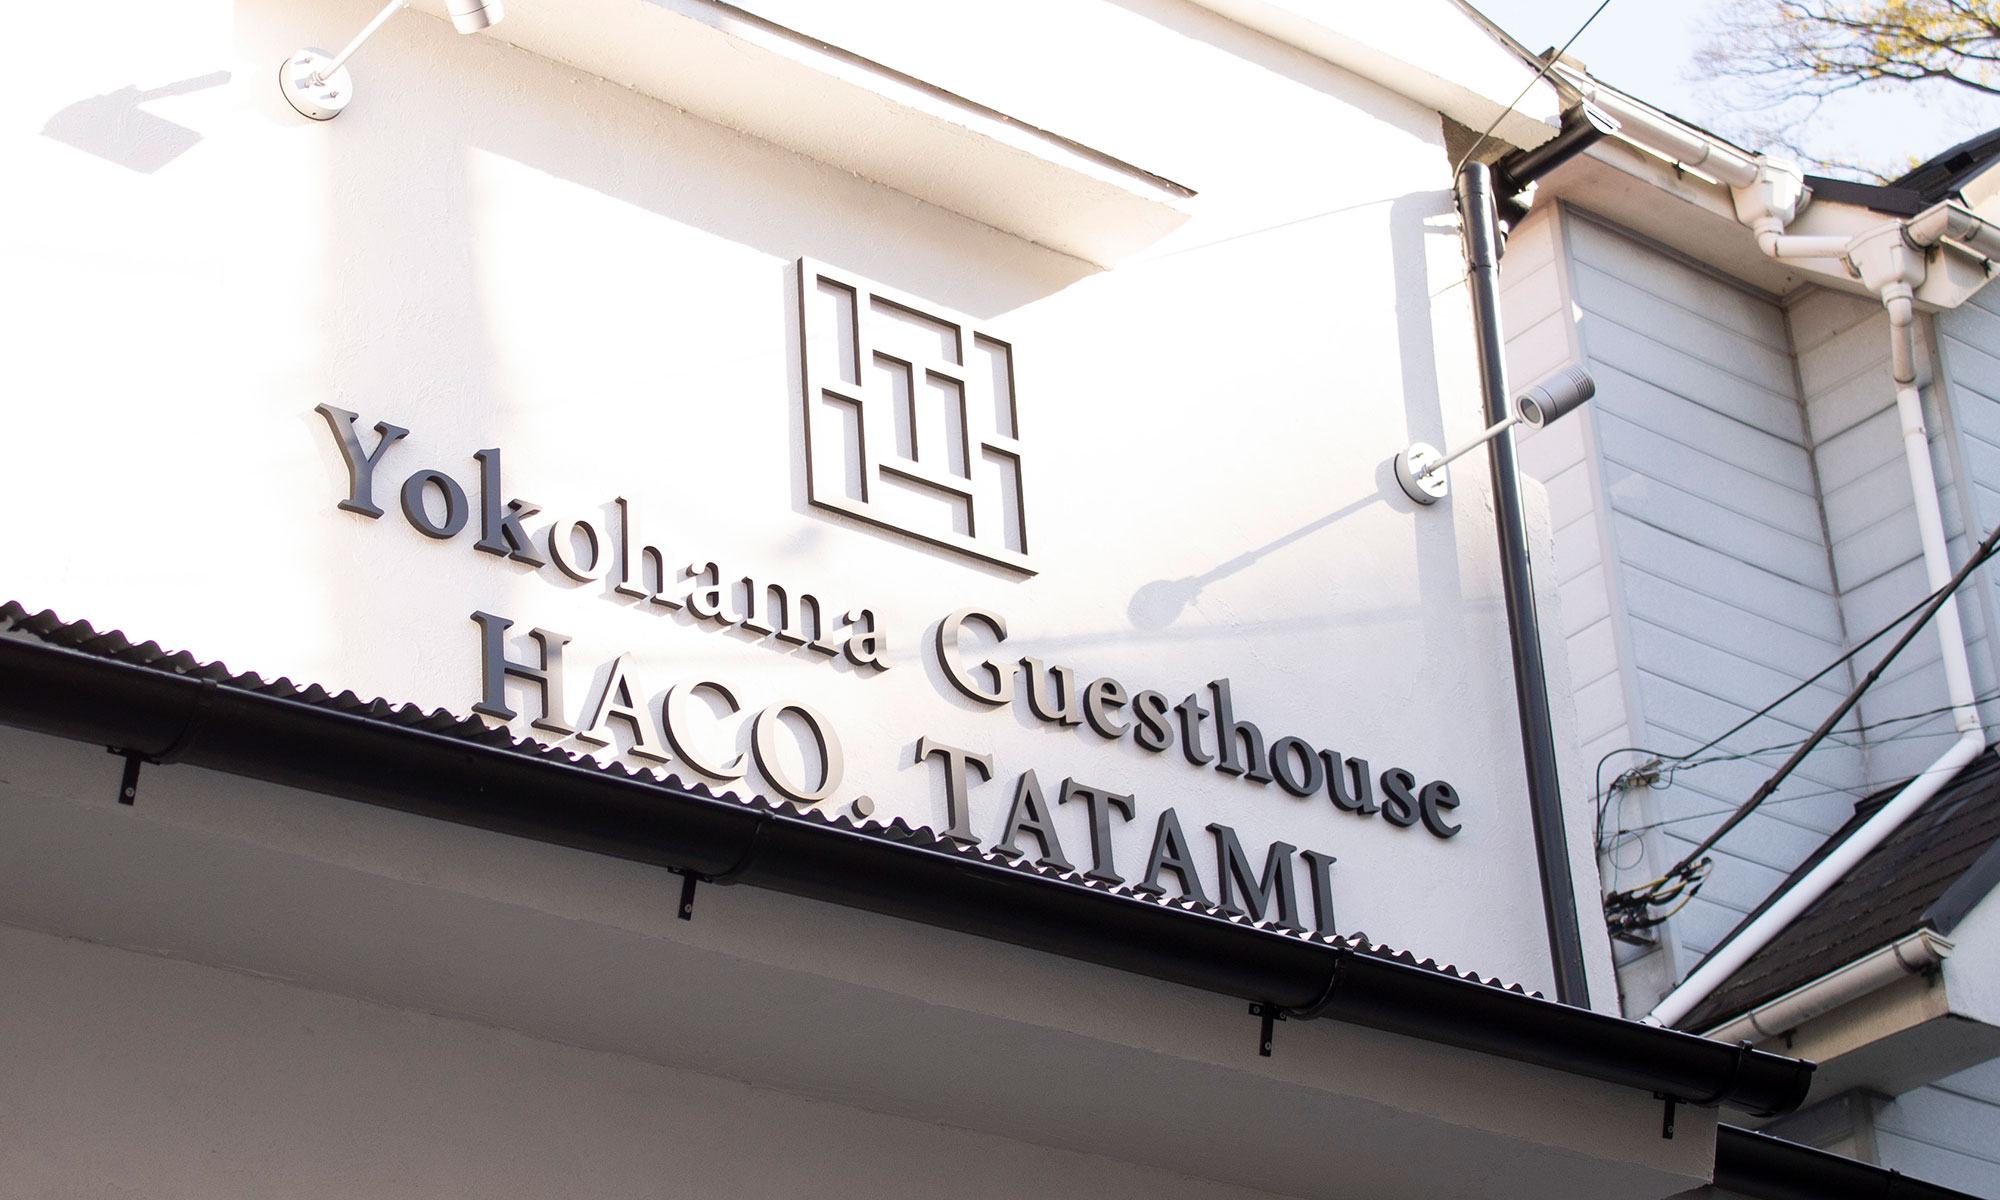 Yokohama Guesthouse HACO. TATAMI.